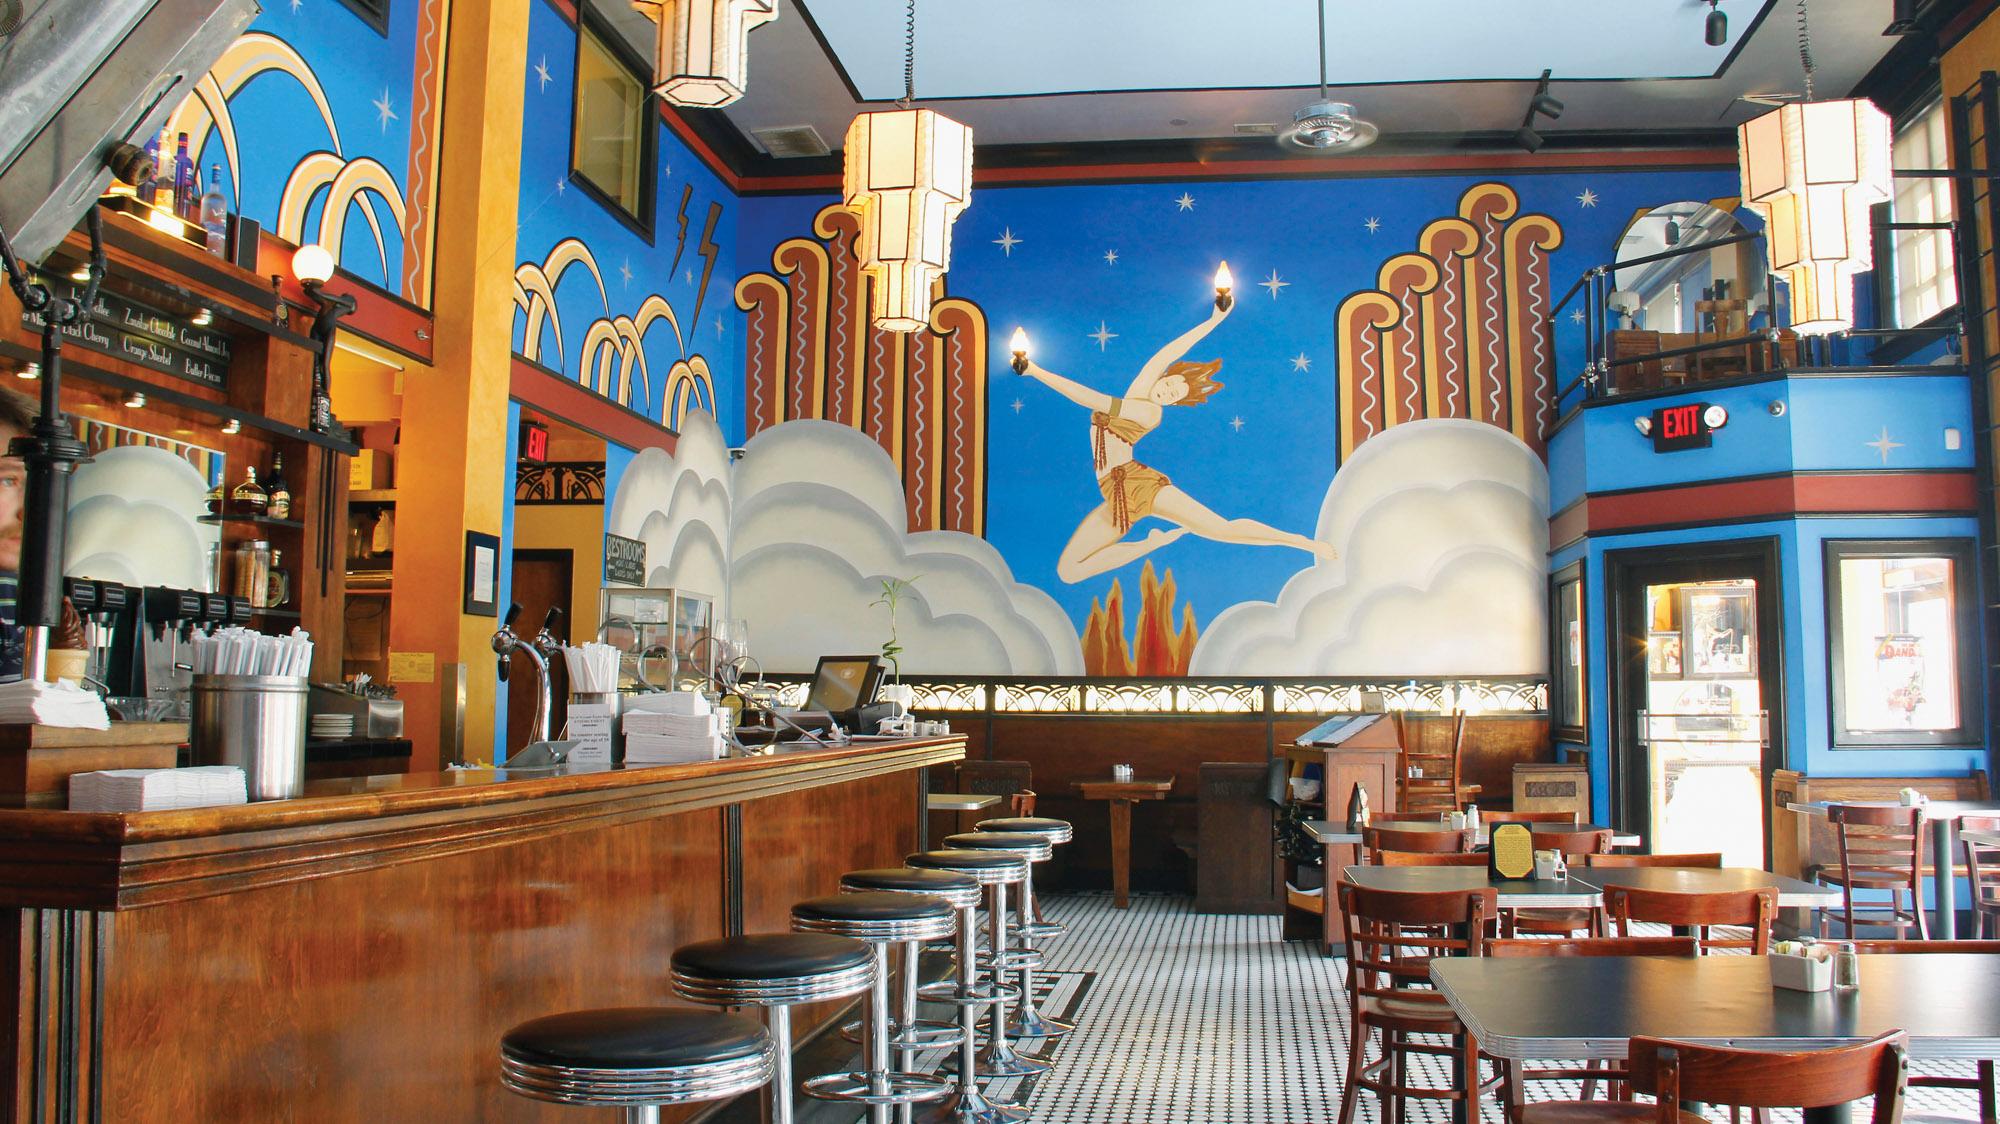 murals by artist Joy Christensen